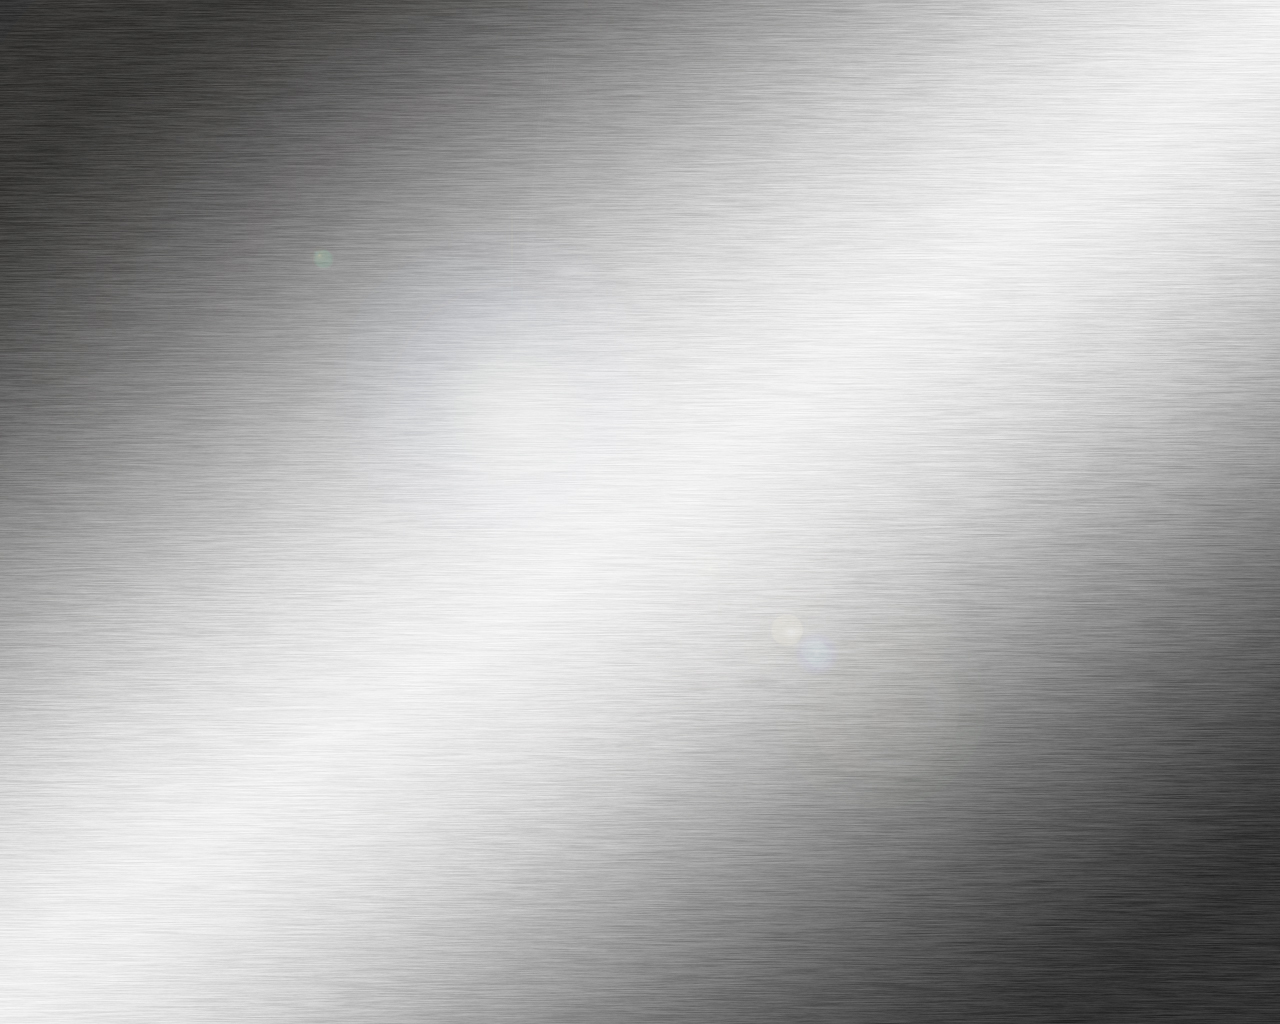 grey powerpoint background